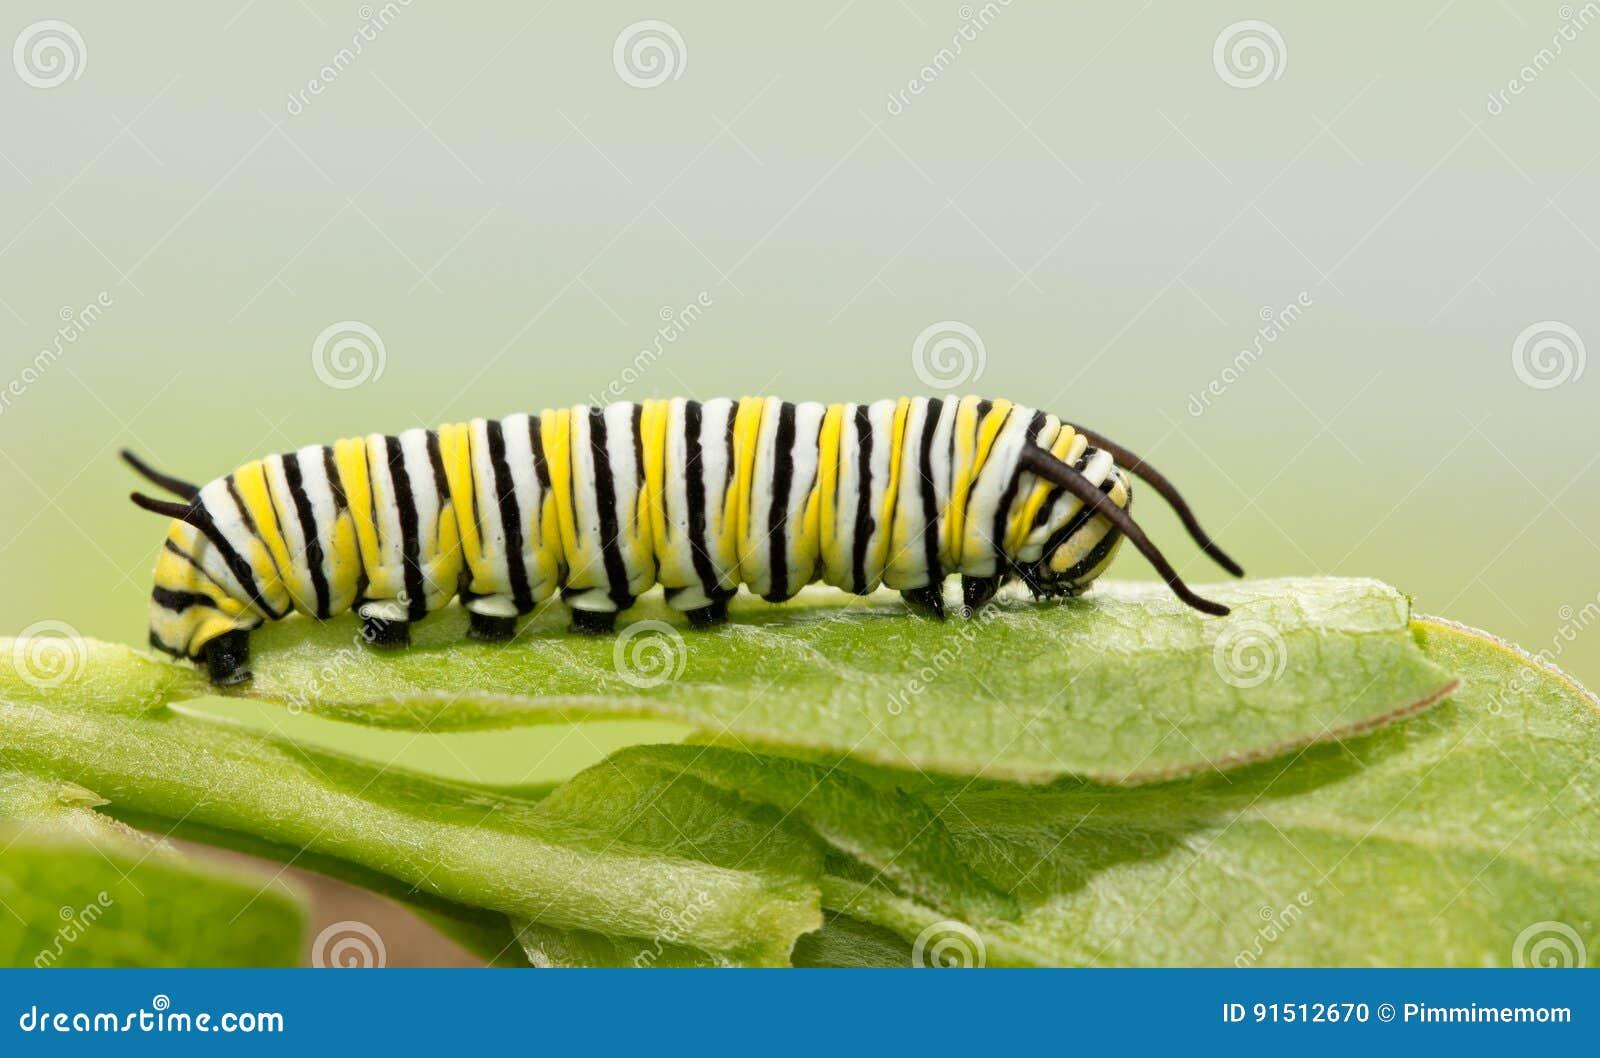 Гусеница монарха 7 дней старая отдыхая на лист milkweed